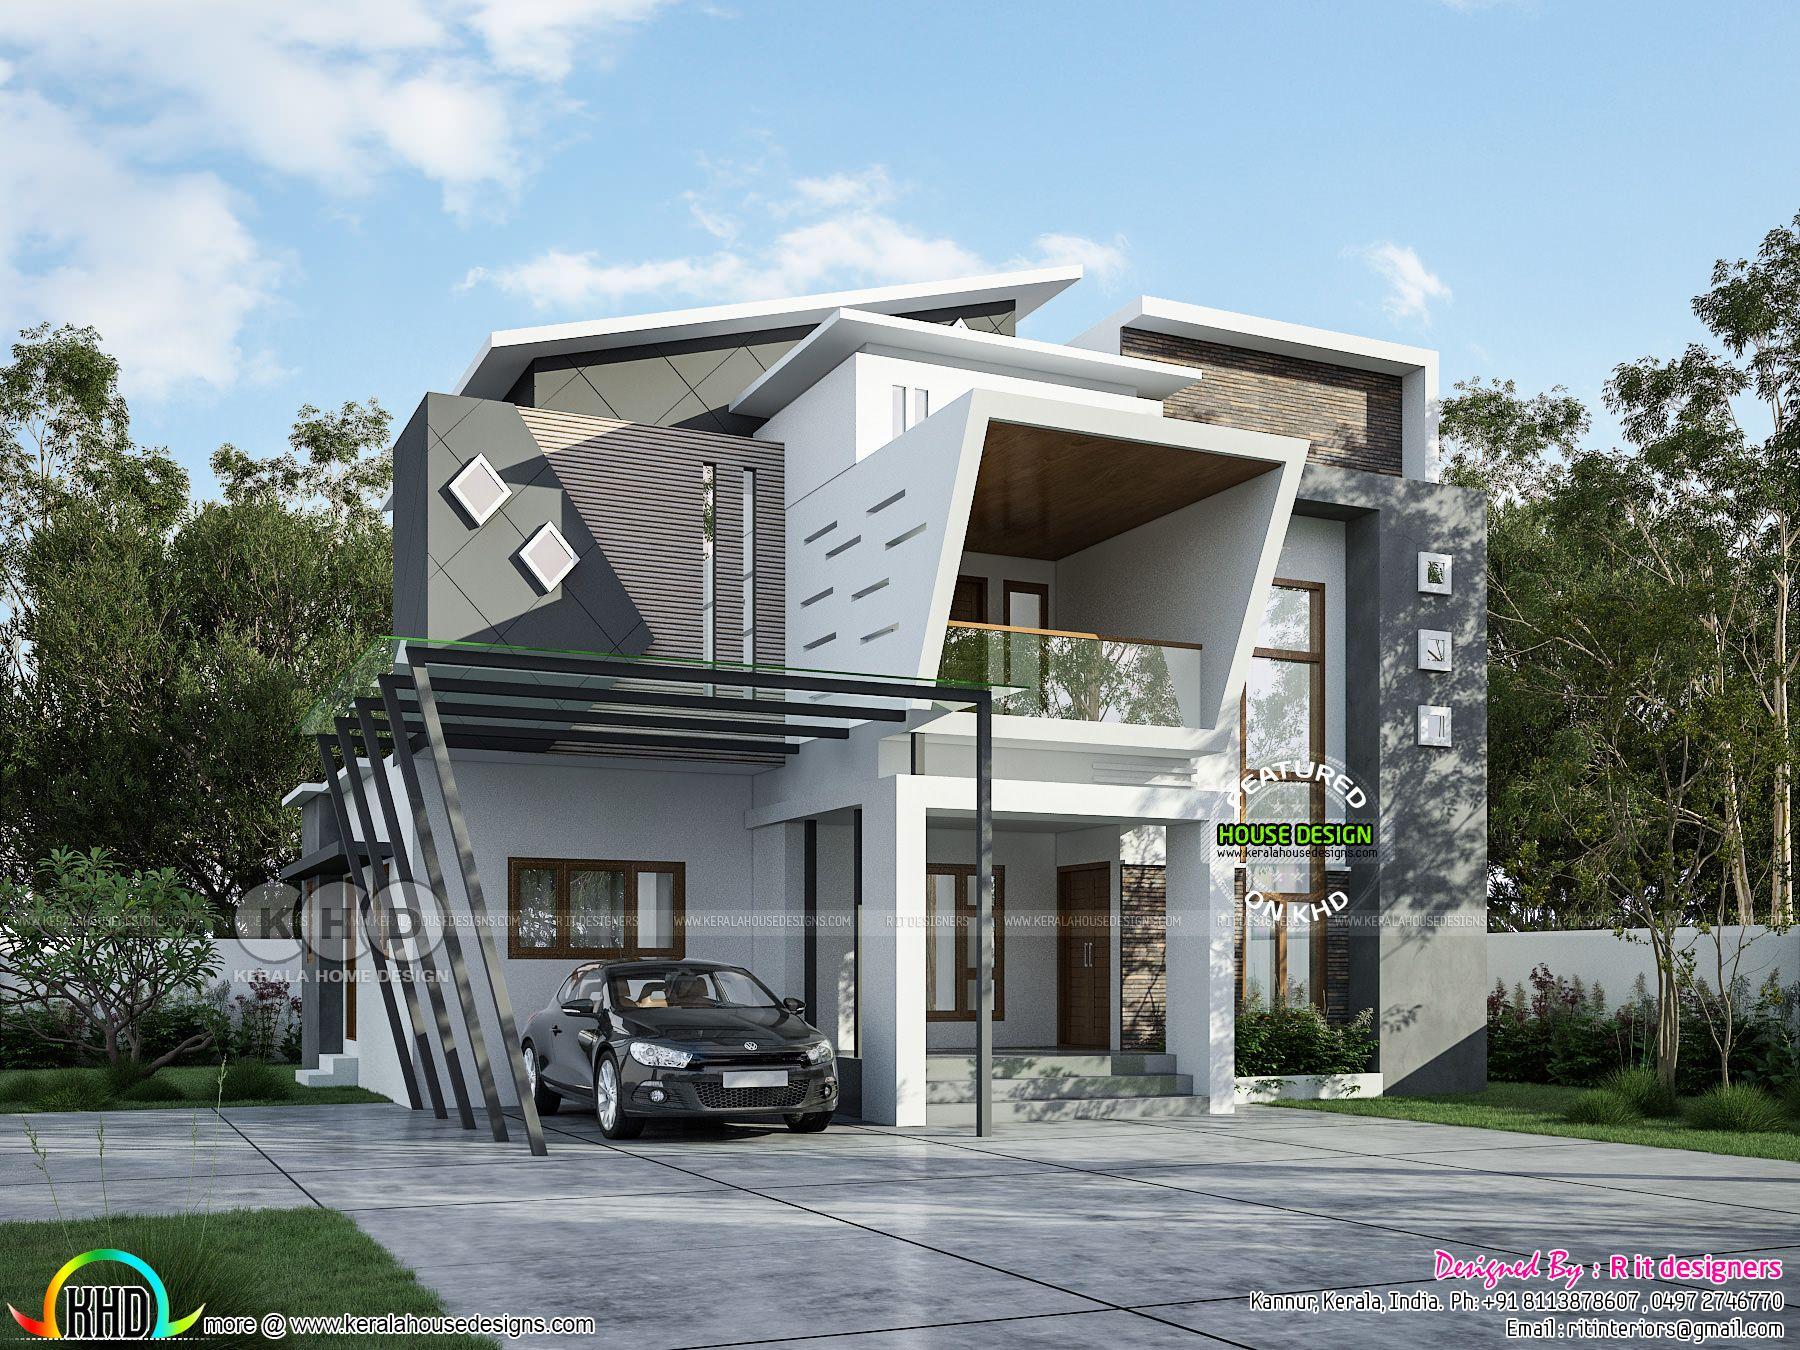 3068 Square Feet 3 Bhk Ultra Modern Home Kerala House Design Duplex House Design Contemporary House Design